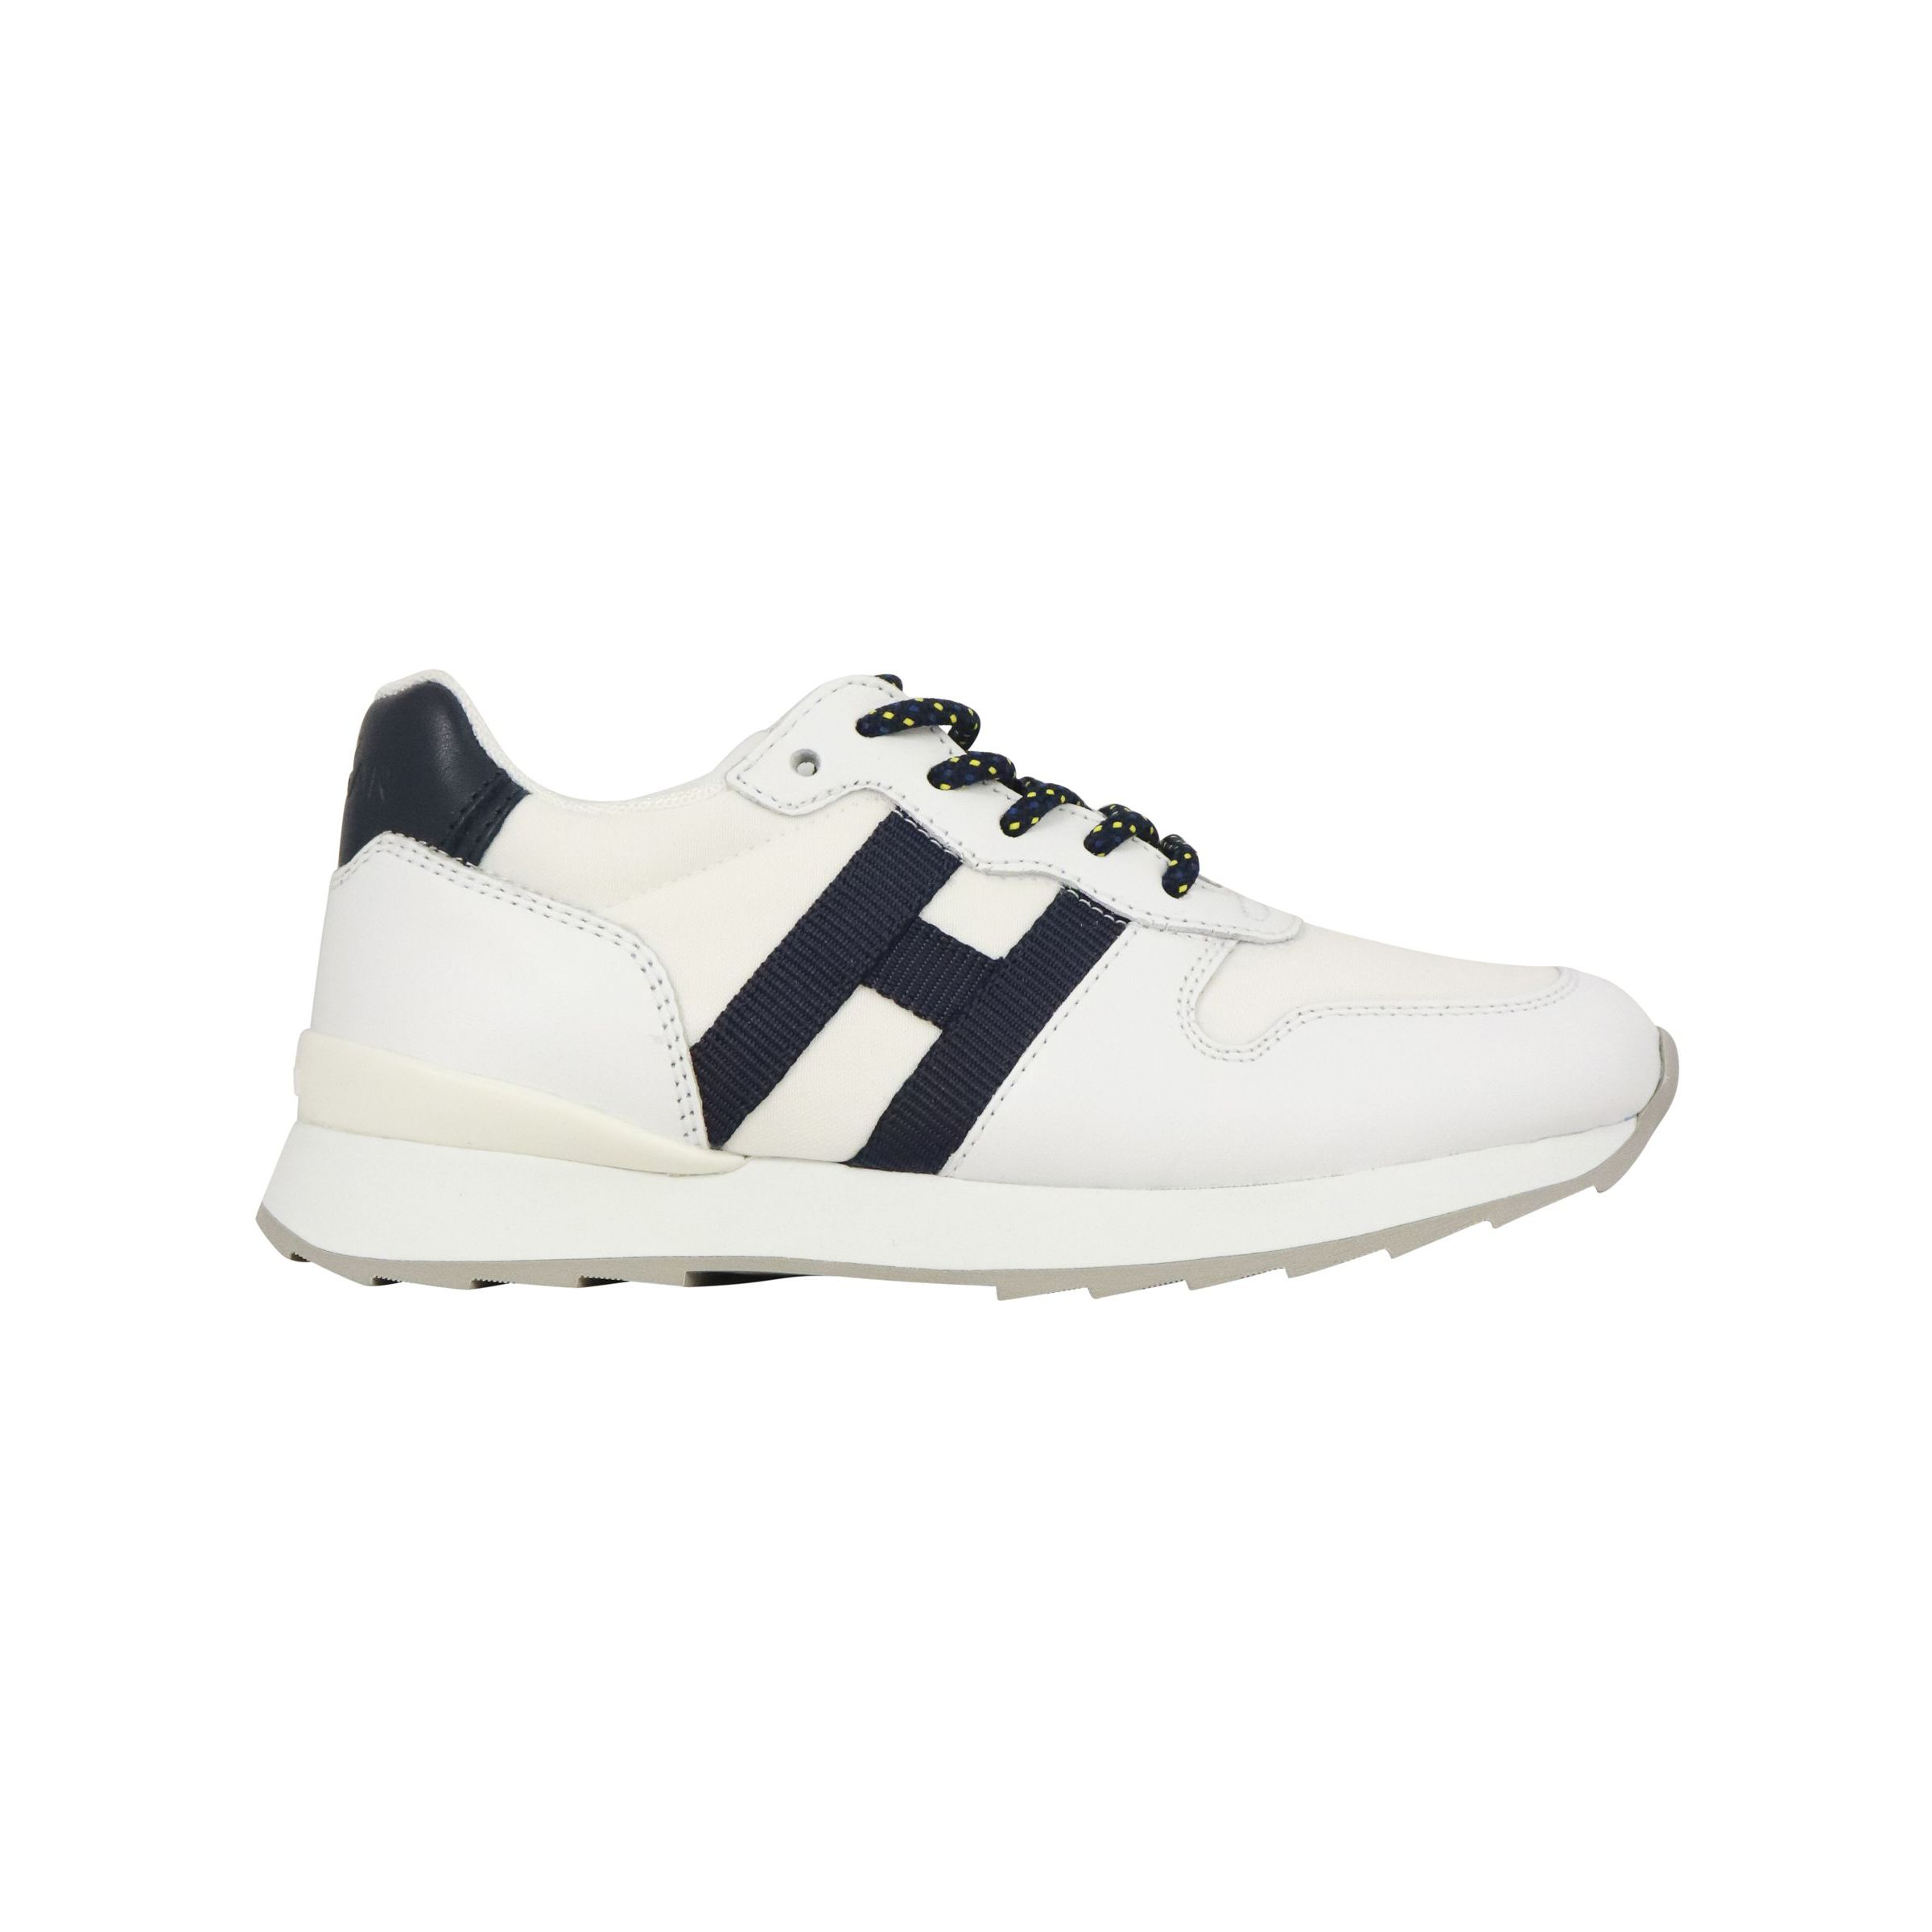 Sneakers Hogan in pelle con H nastro Bianco, hxc4840cy50ftq ...